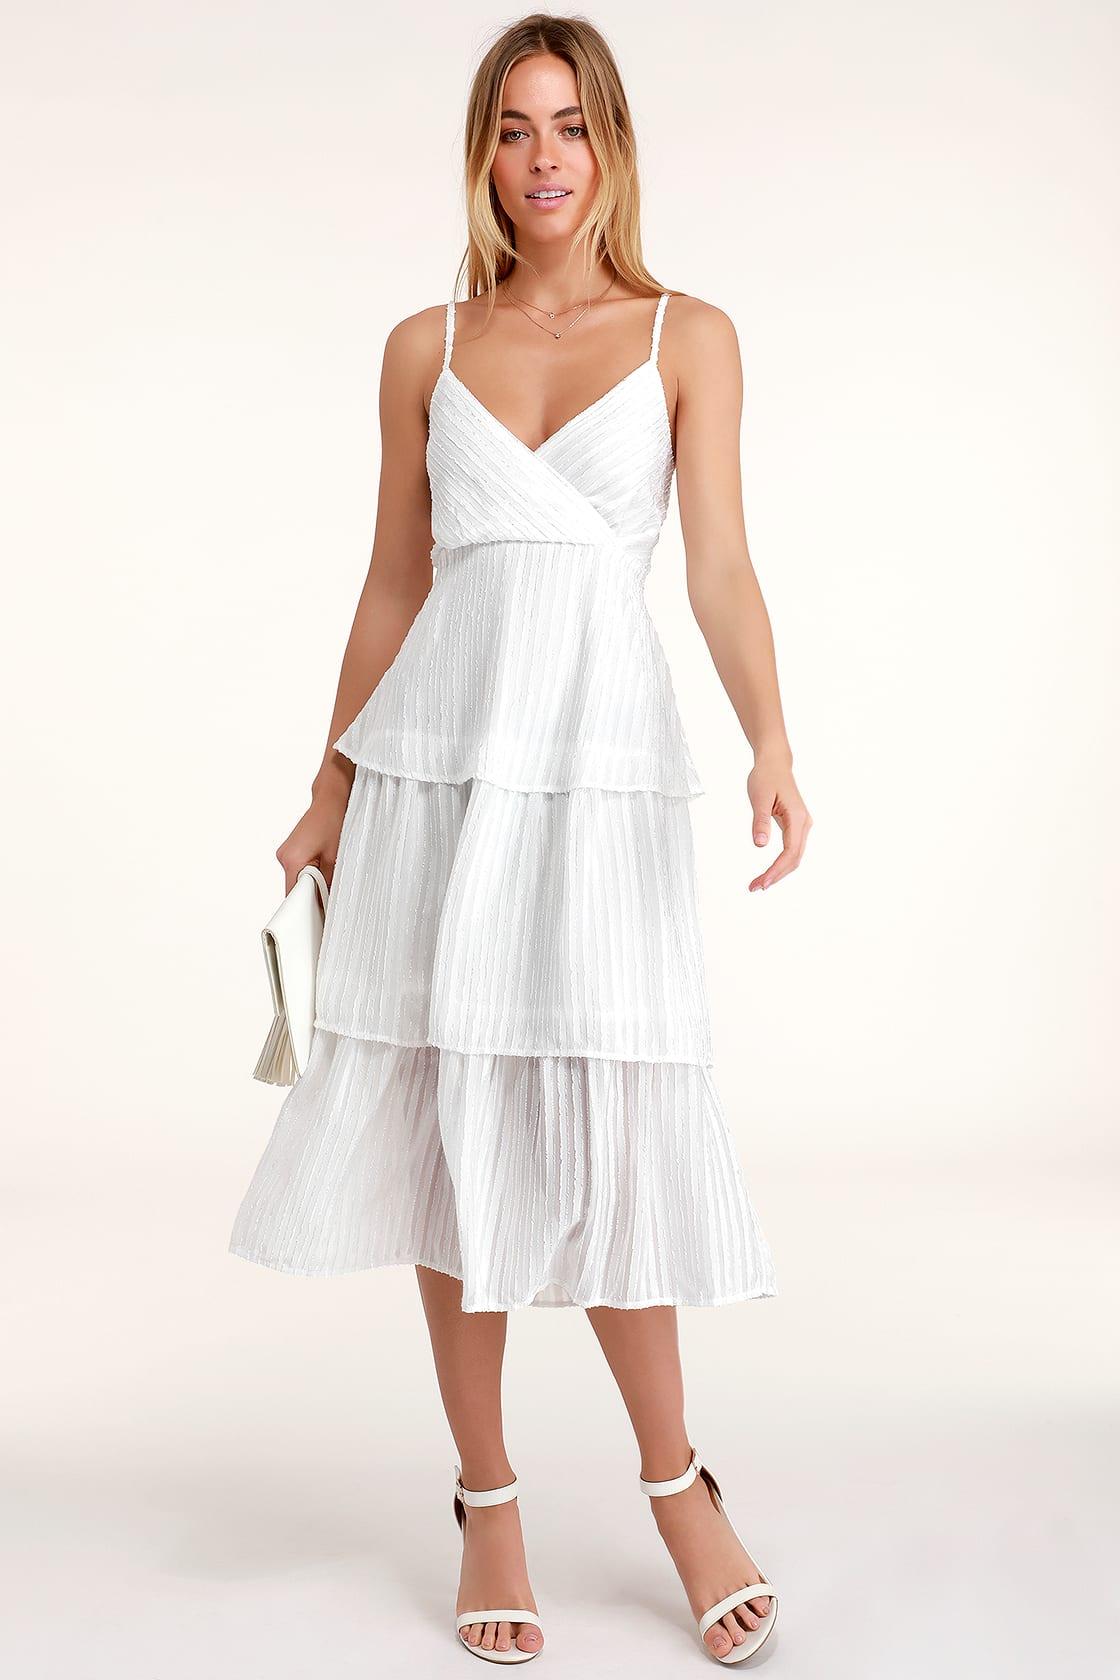 Blaine White Striped Tiered Midi Dress